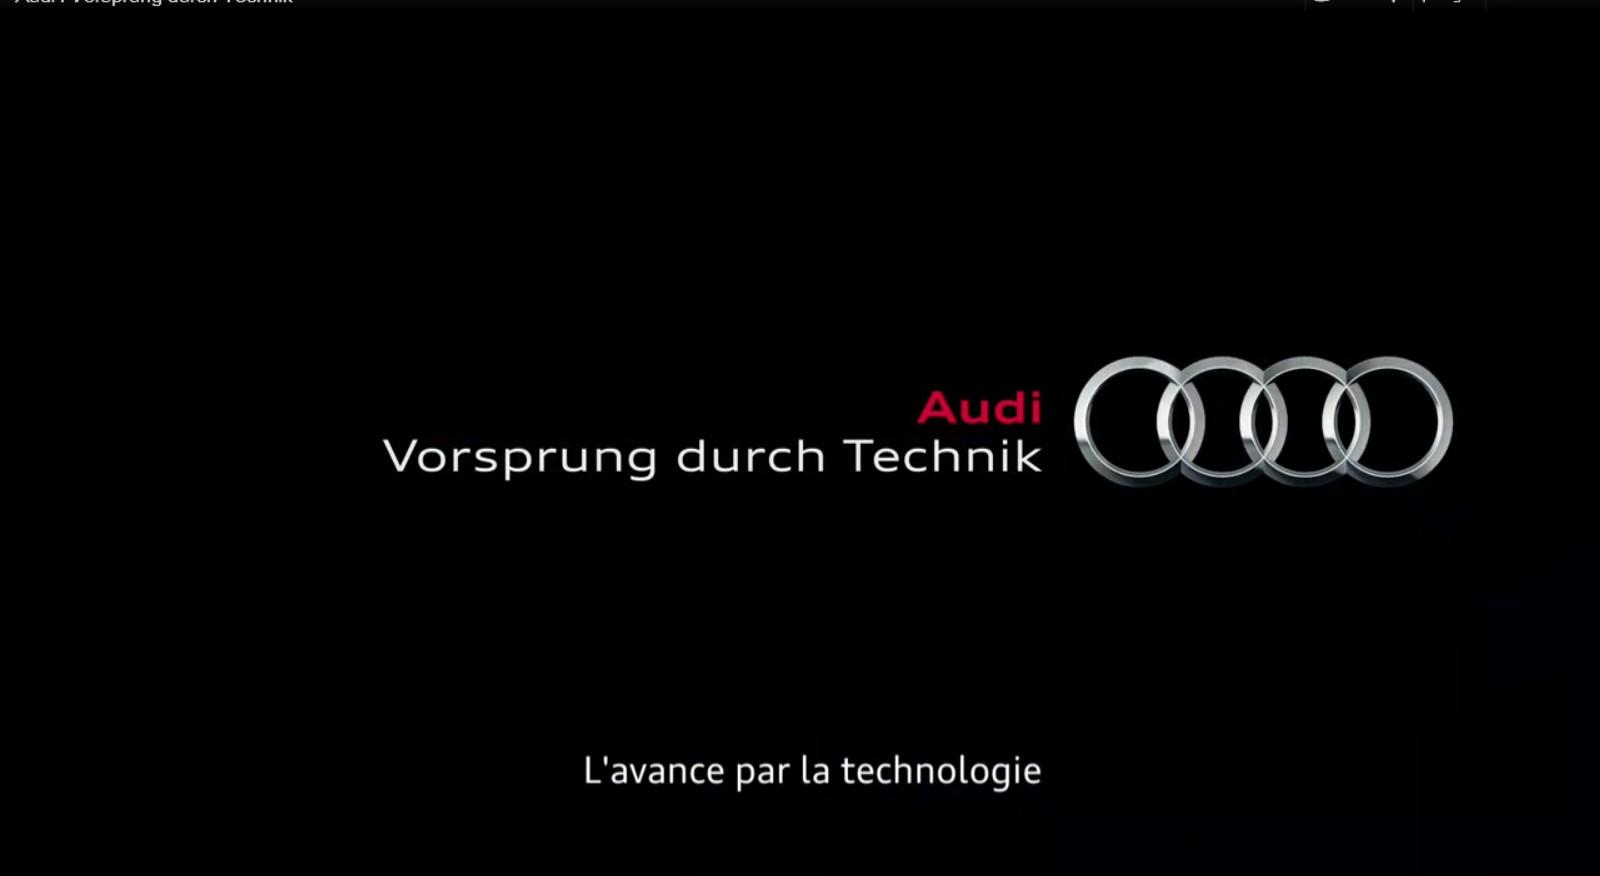 Audi Newz Pub Le Slogan Vorsprung Durch Technik Mis En